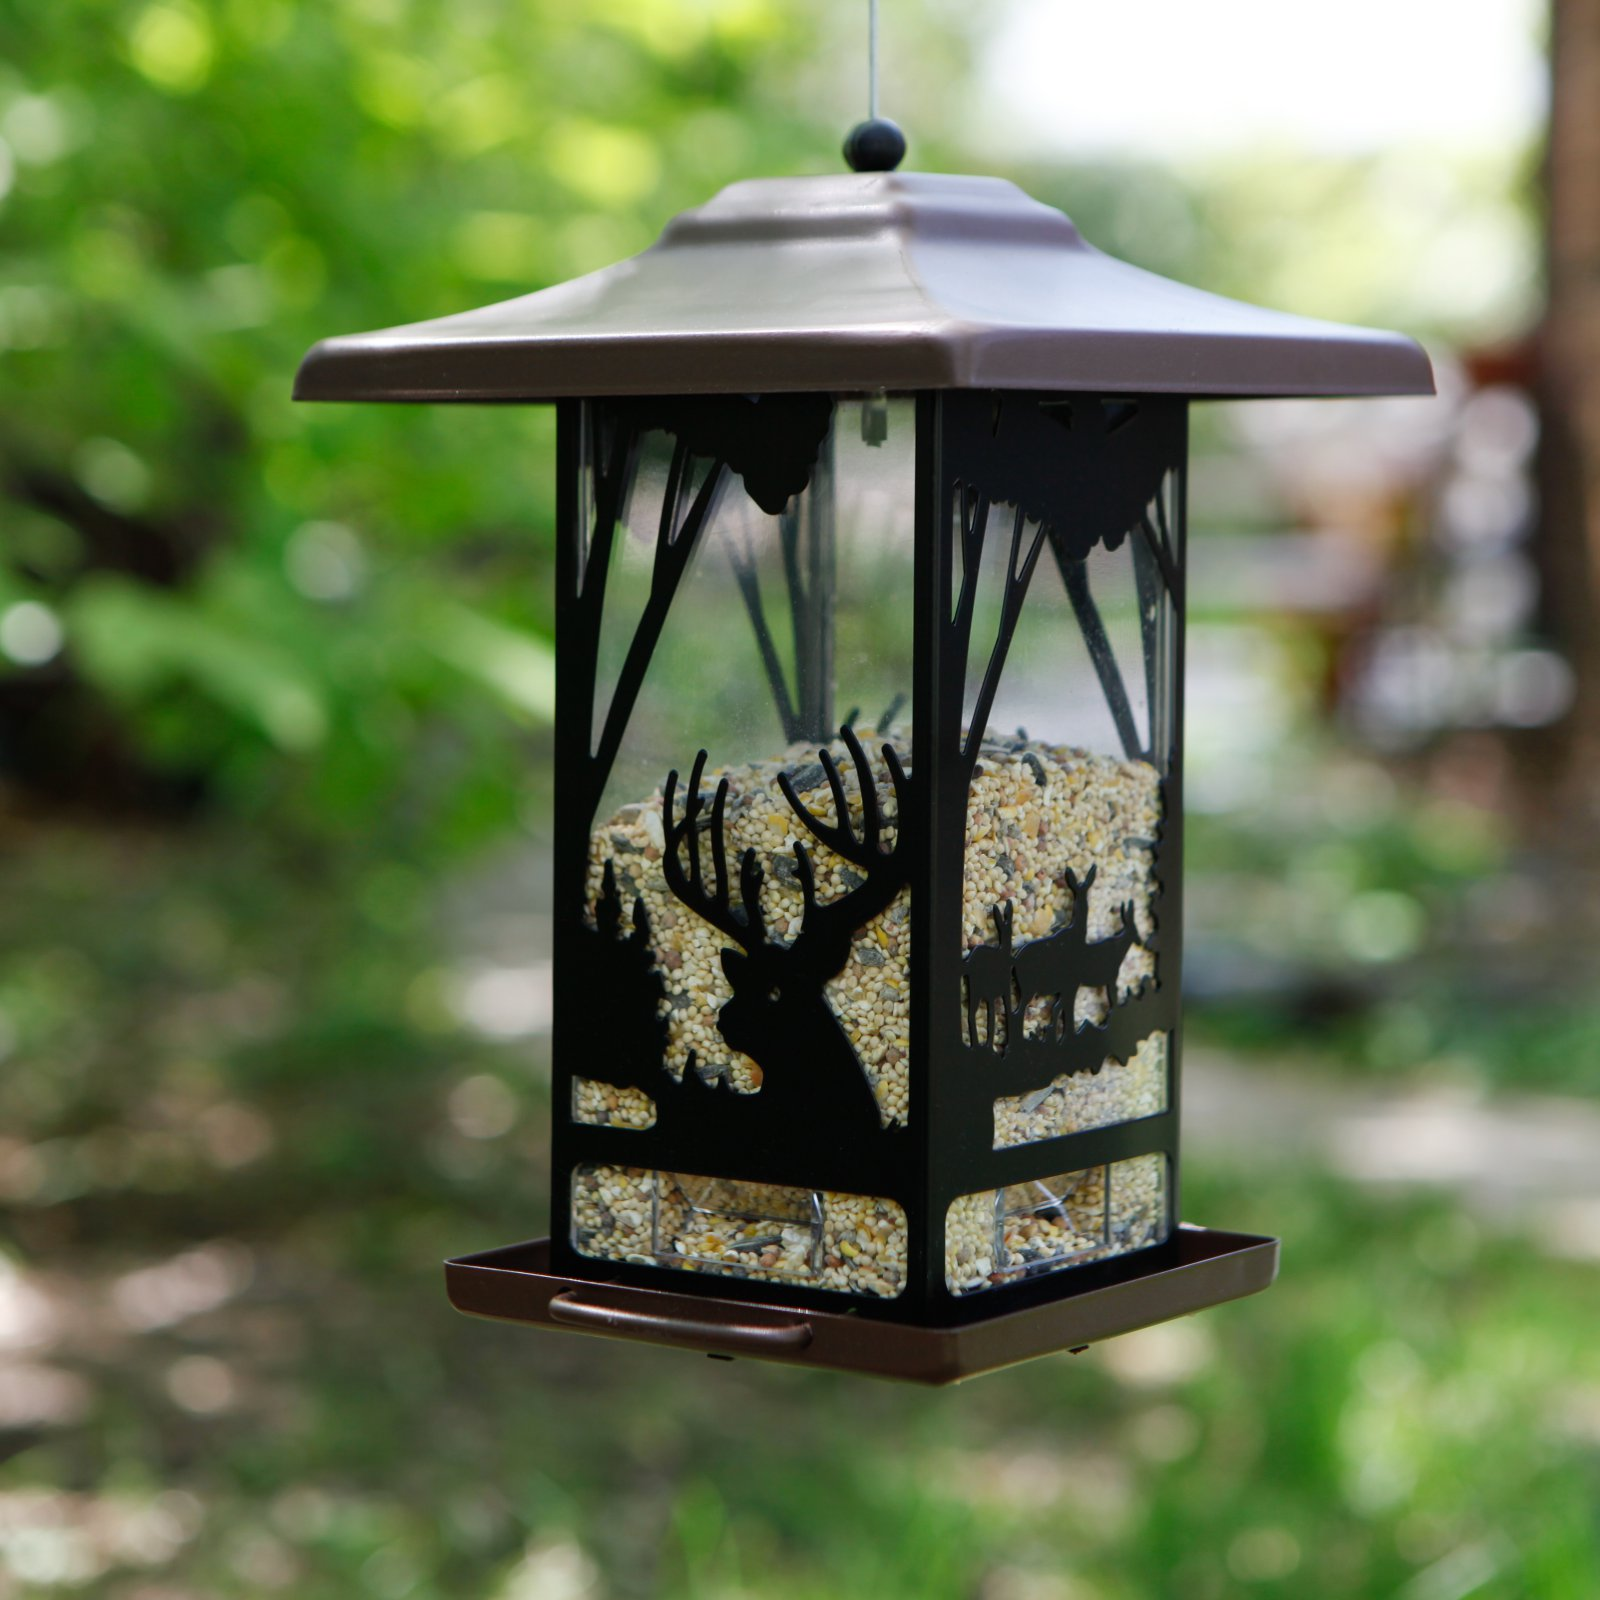 Perky-Pet 2 lb Wilderness Lantern Wild Bird Feeder